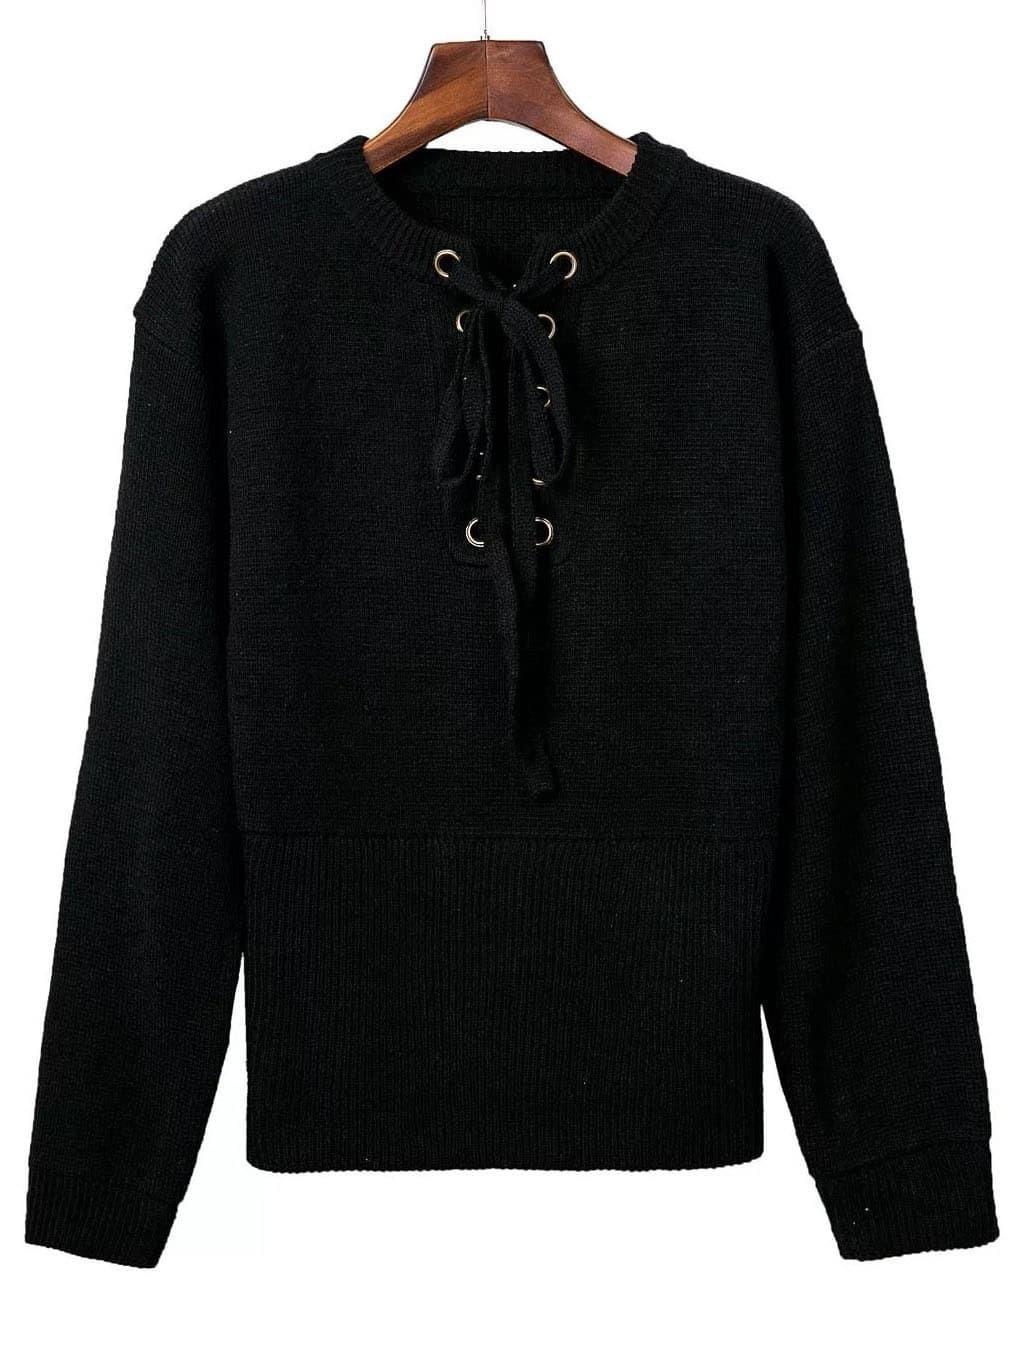 Black Ribbed Cuff Wide Hem Lace Up Sweater